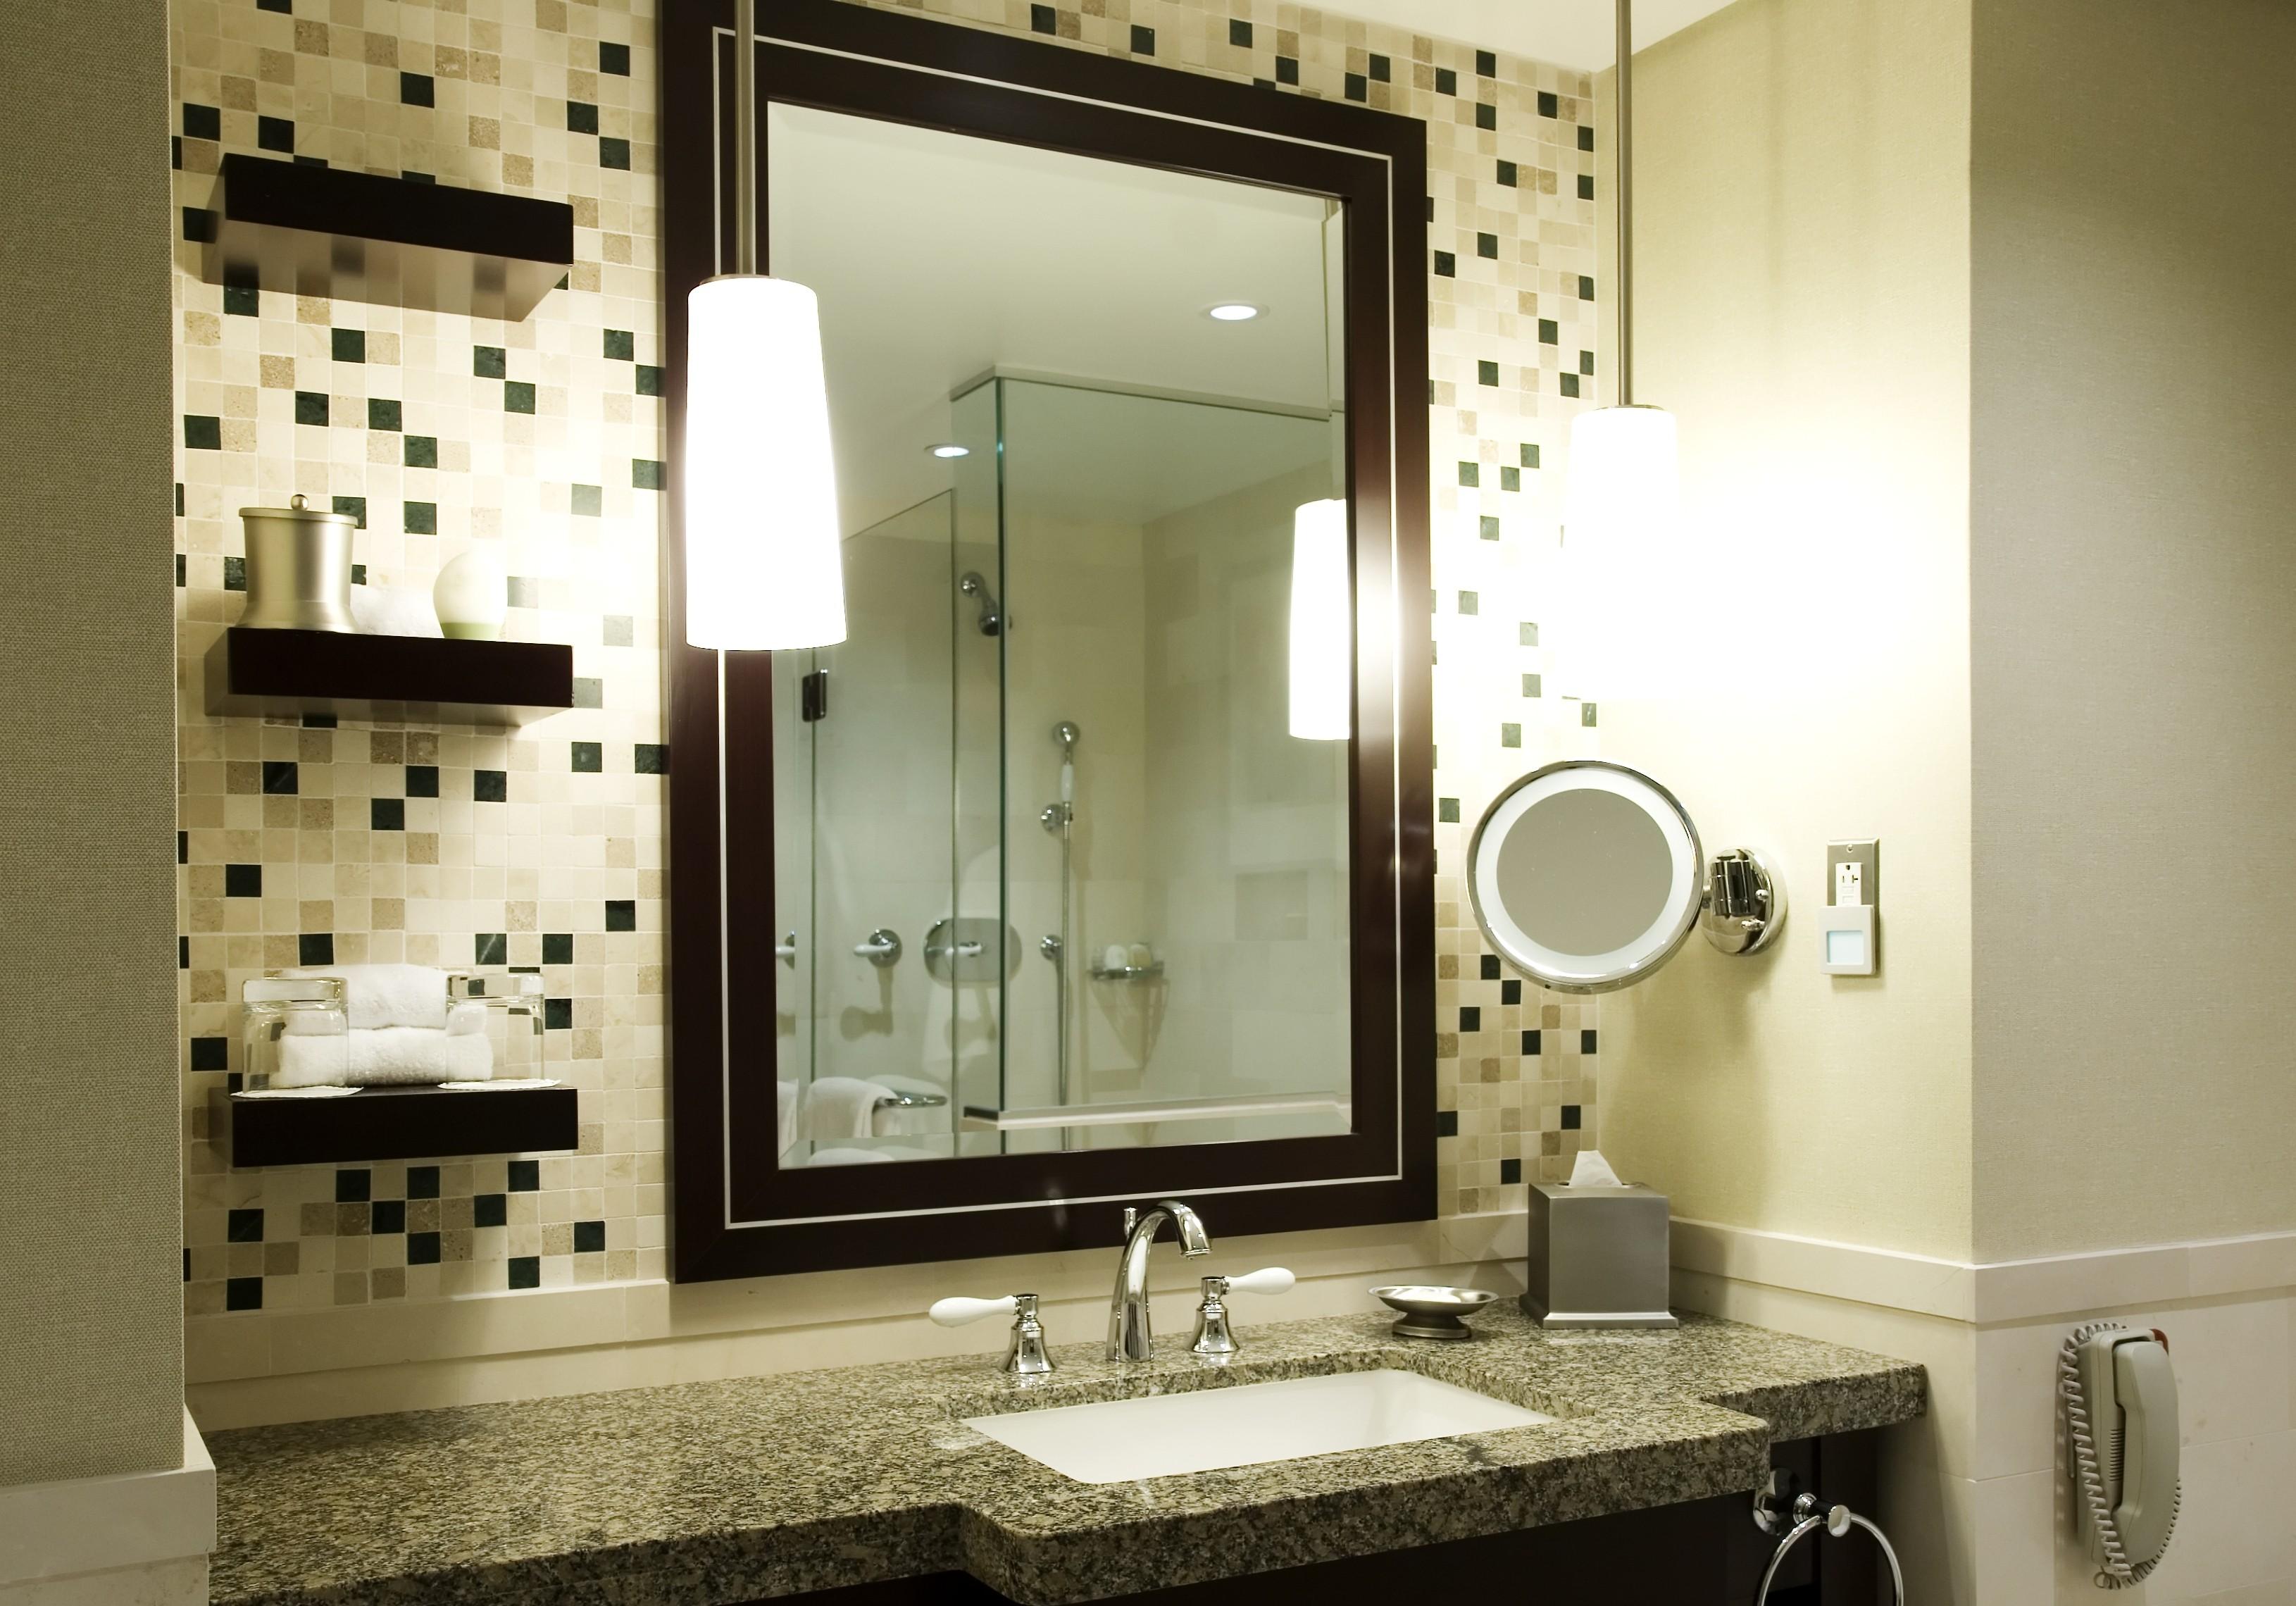 Bathroom Lighting Needs 5 tips for lighting a bathroom